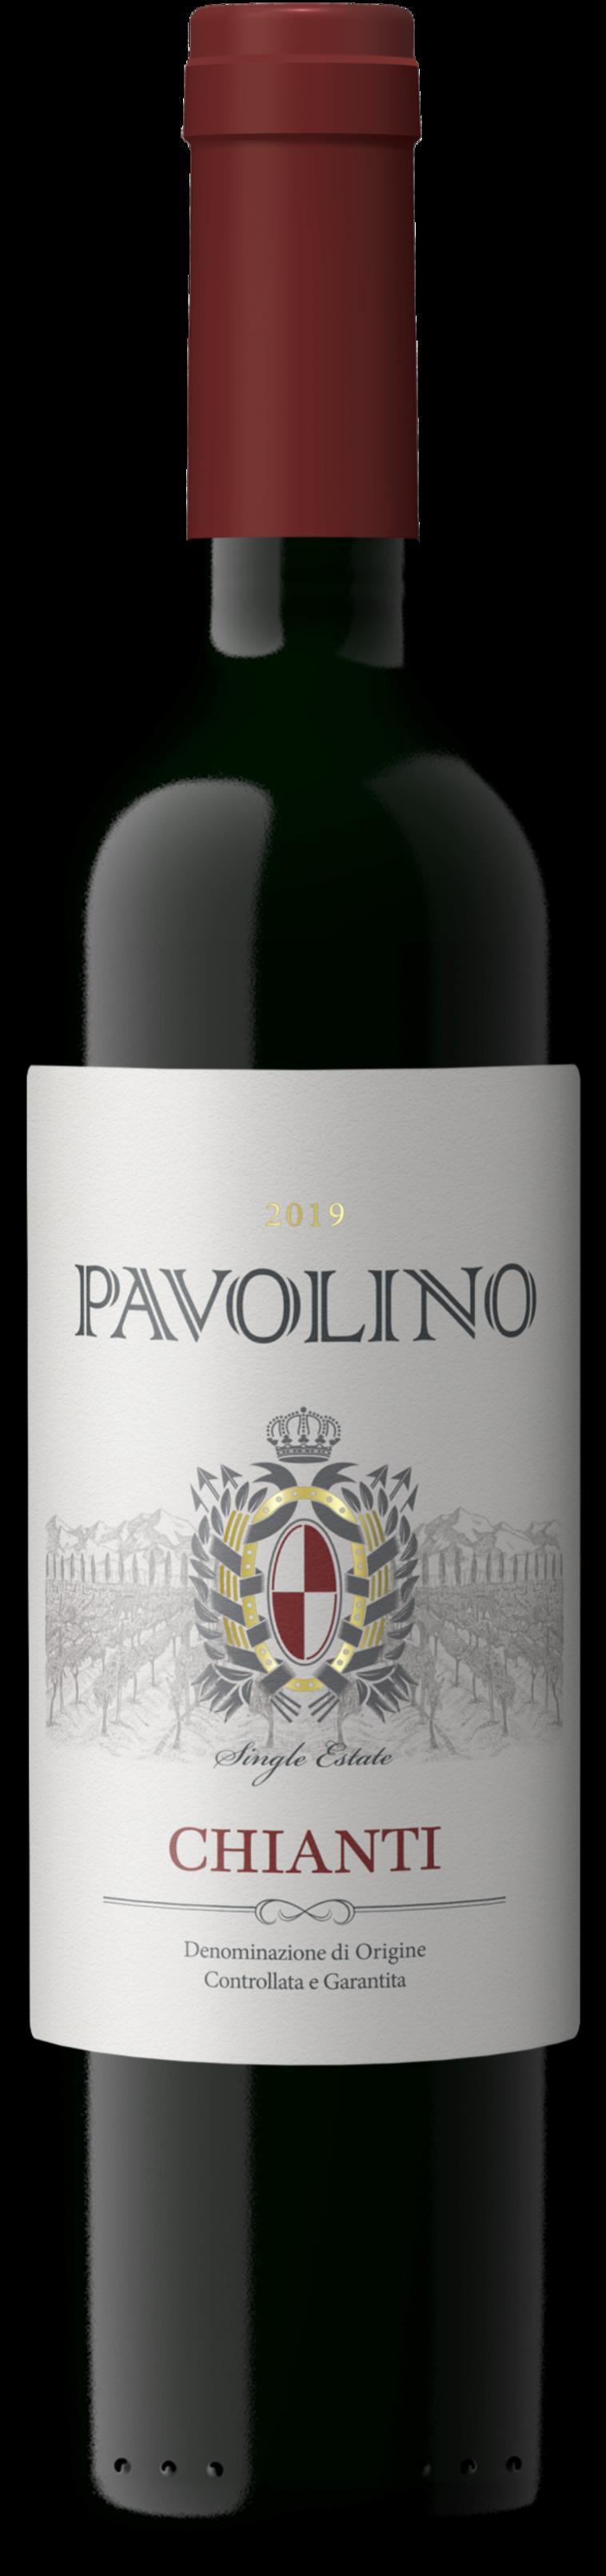 Pavolino קיאנטי  (צילום: יח''צ)